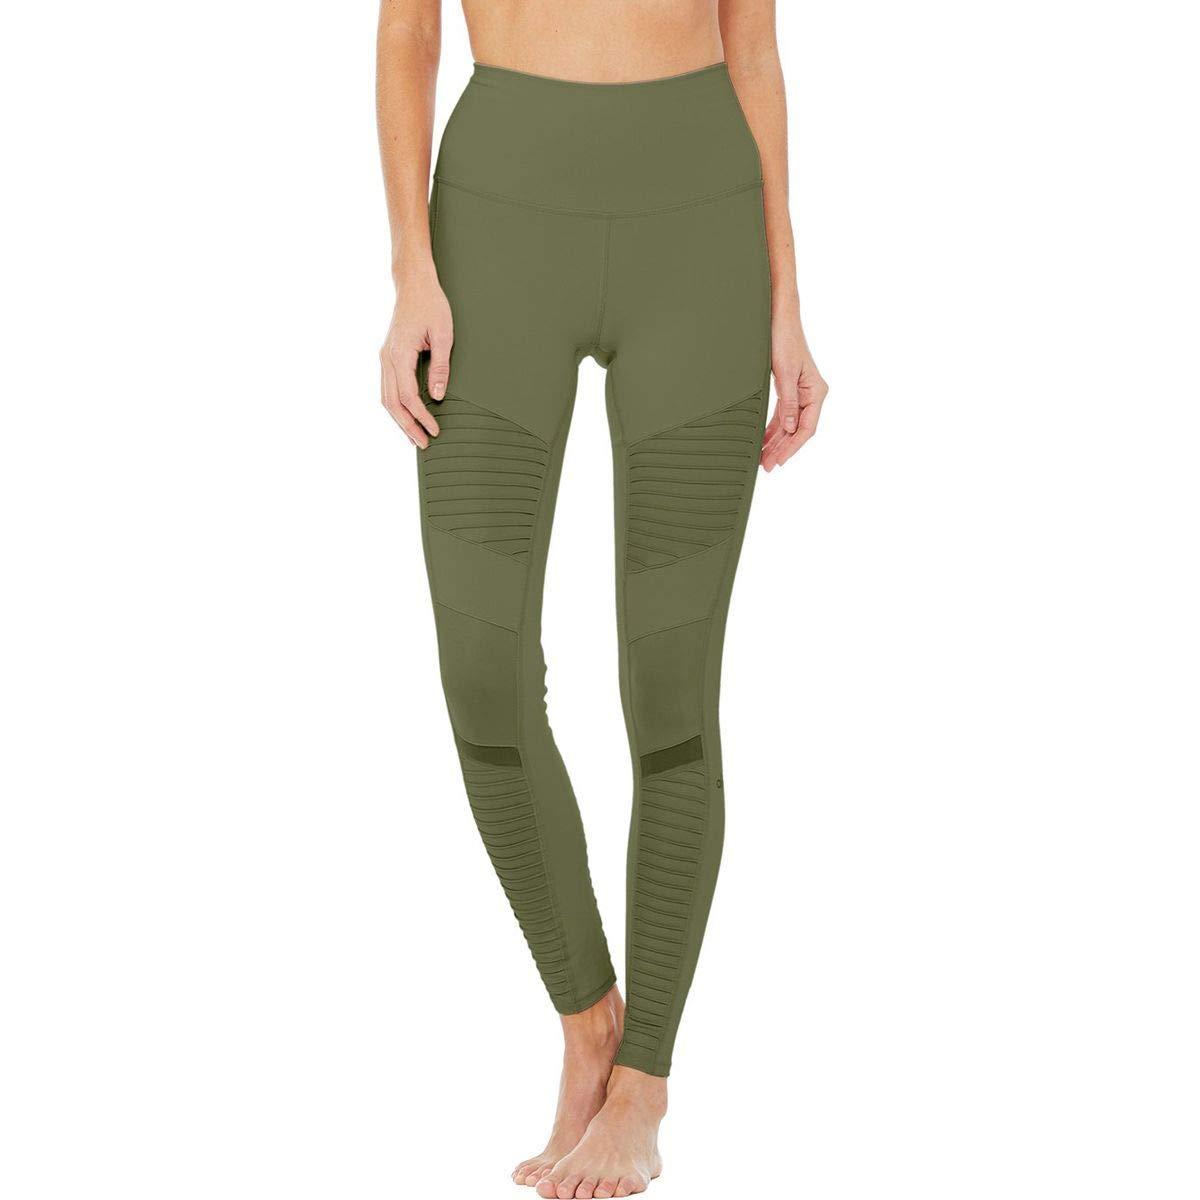 81ce5a21174a4 Get Quotations · Alo Yoga High-Waist Moto Legging - Women's Jungle/Jungle  Glossy, ...